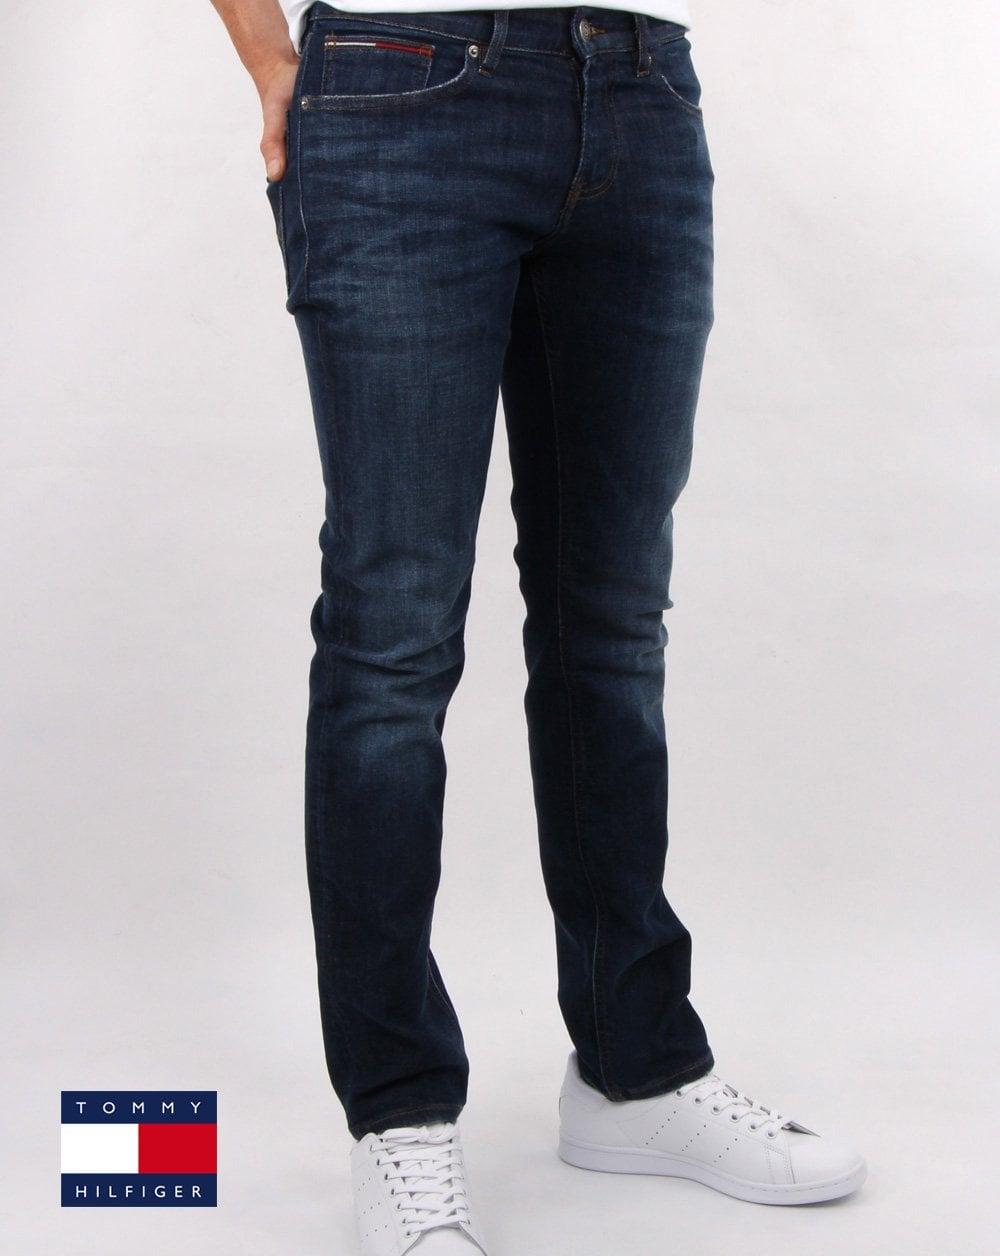 8b6e06006 Tommy Hilfiger Jeans Tommy Hilfiger Slim Scanton Dynamic Stretch Jeans Dark  Blue